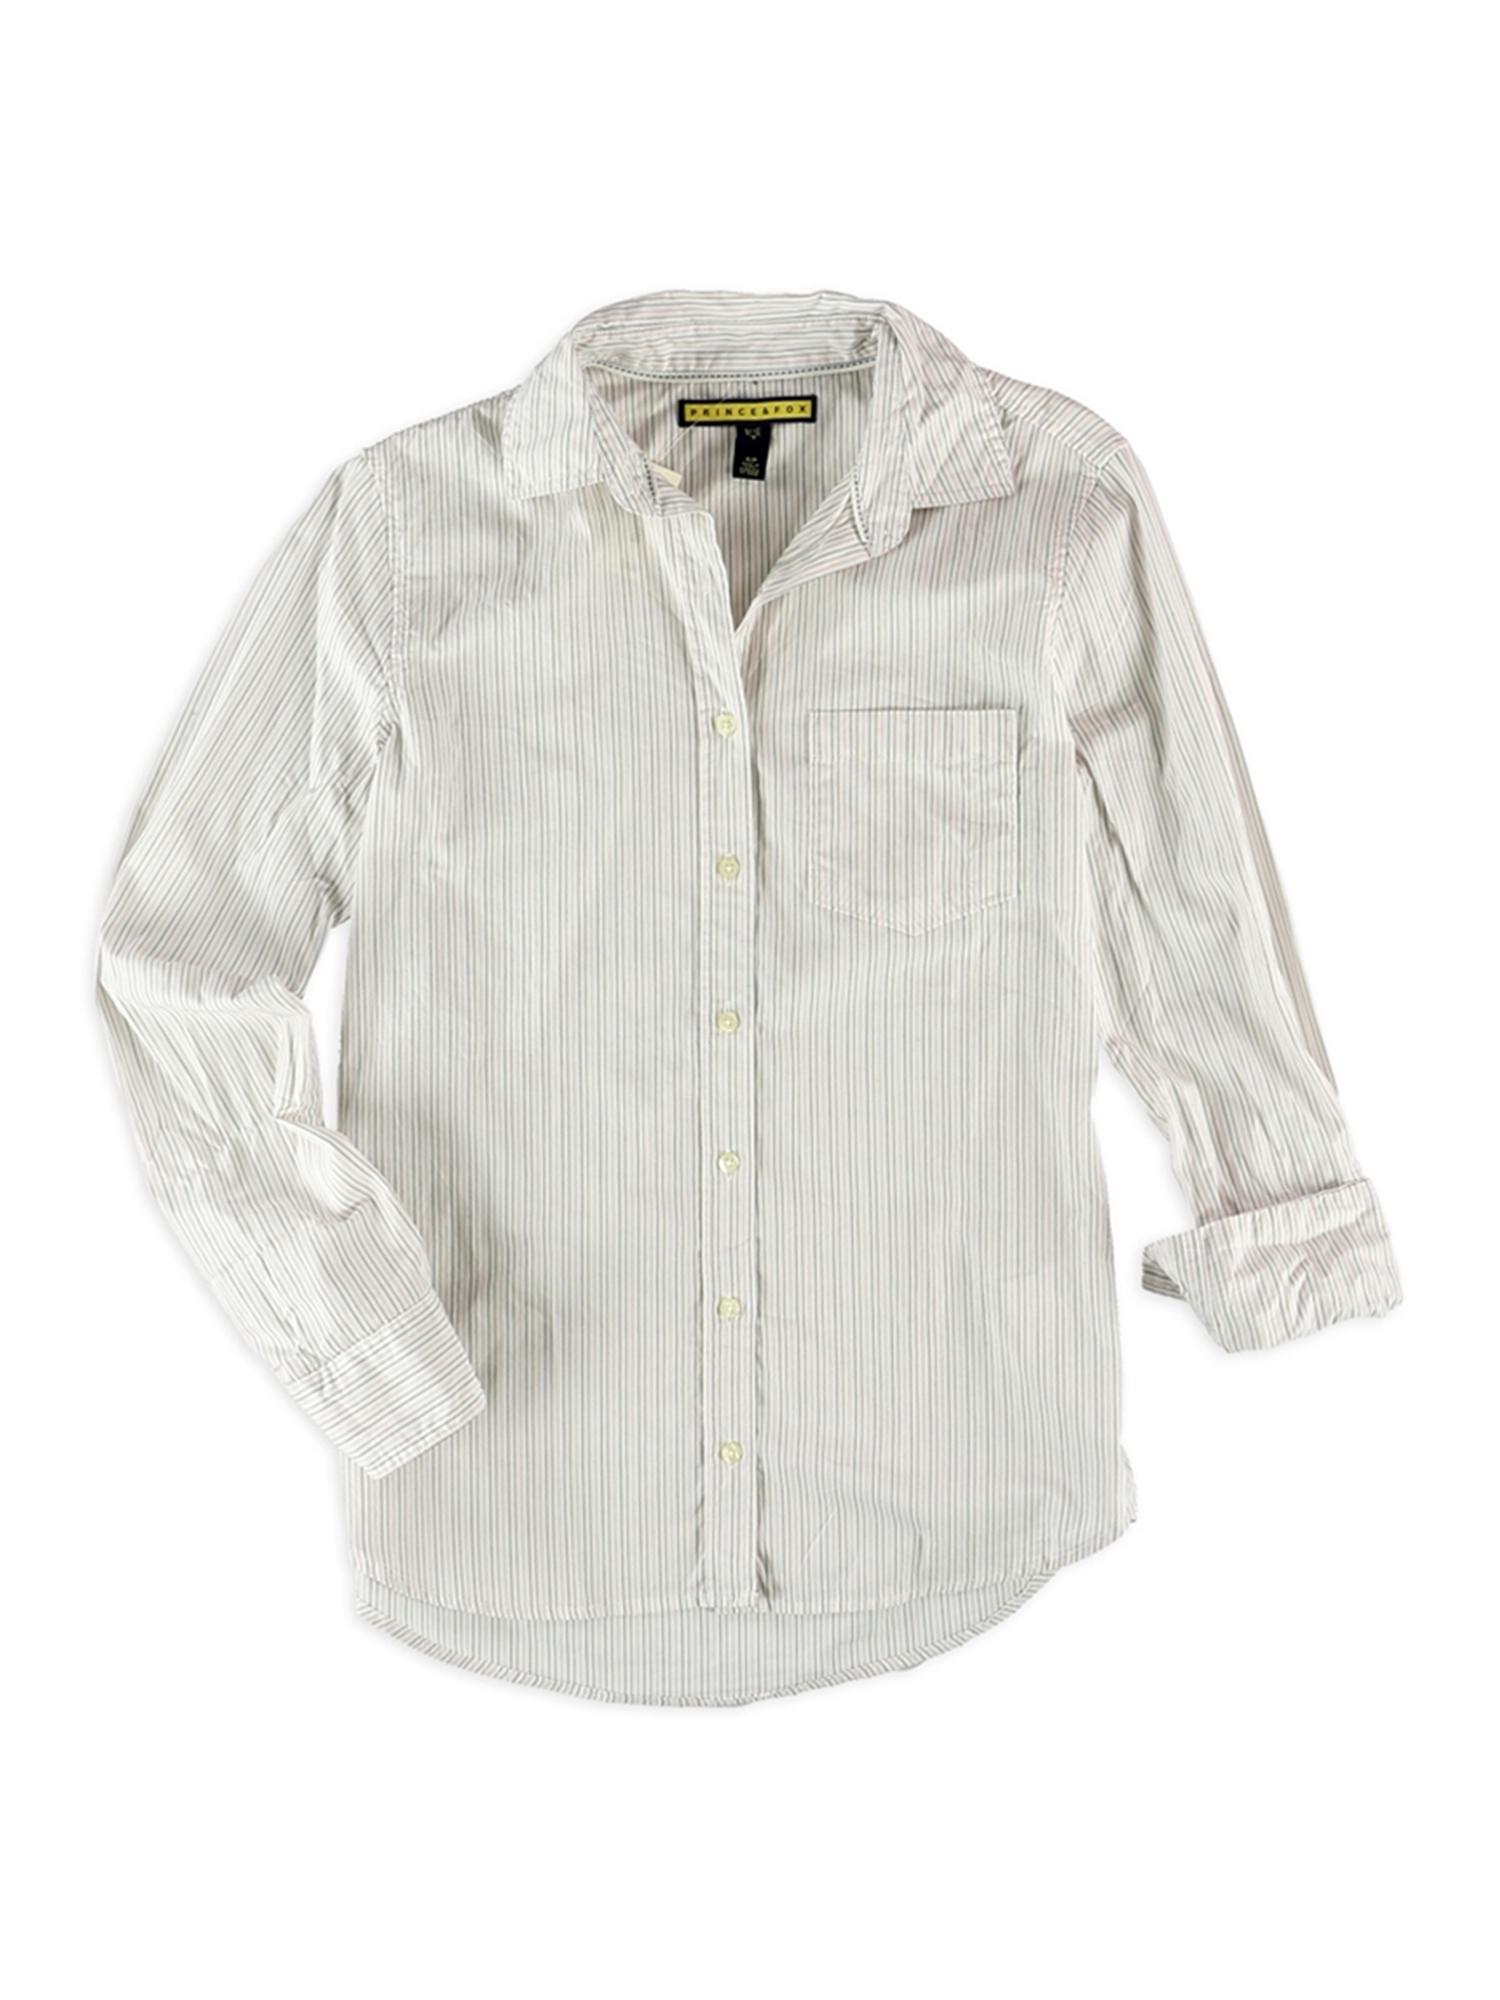 Aeropostale Juniors Striped Pocket Button Up Shirt